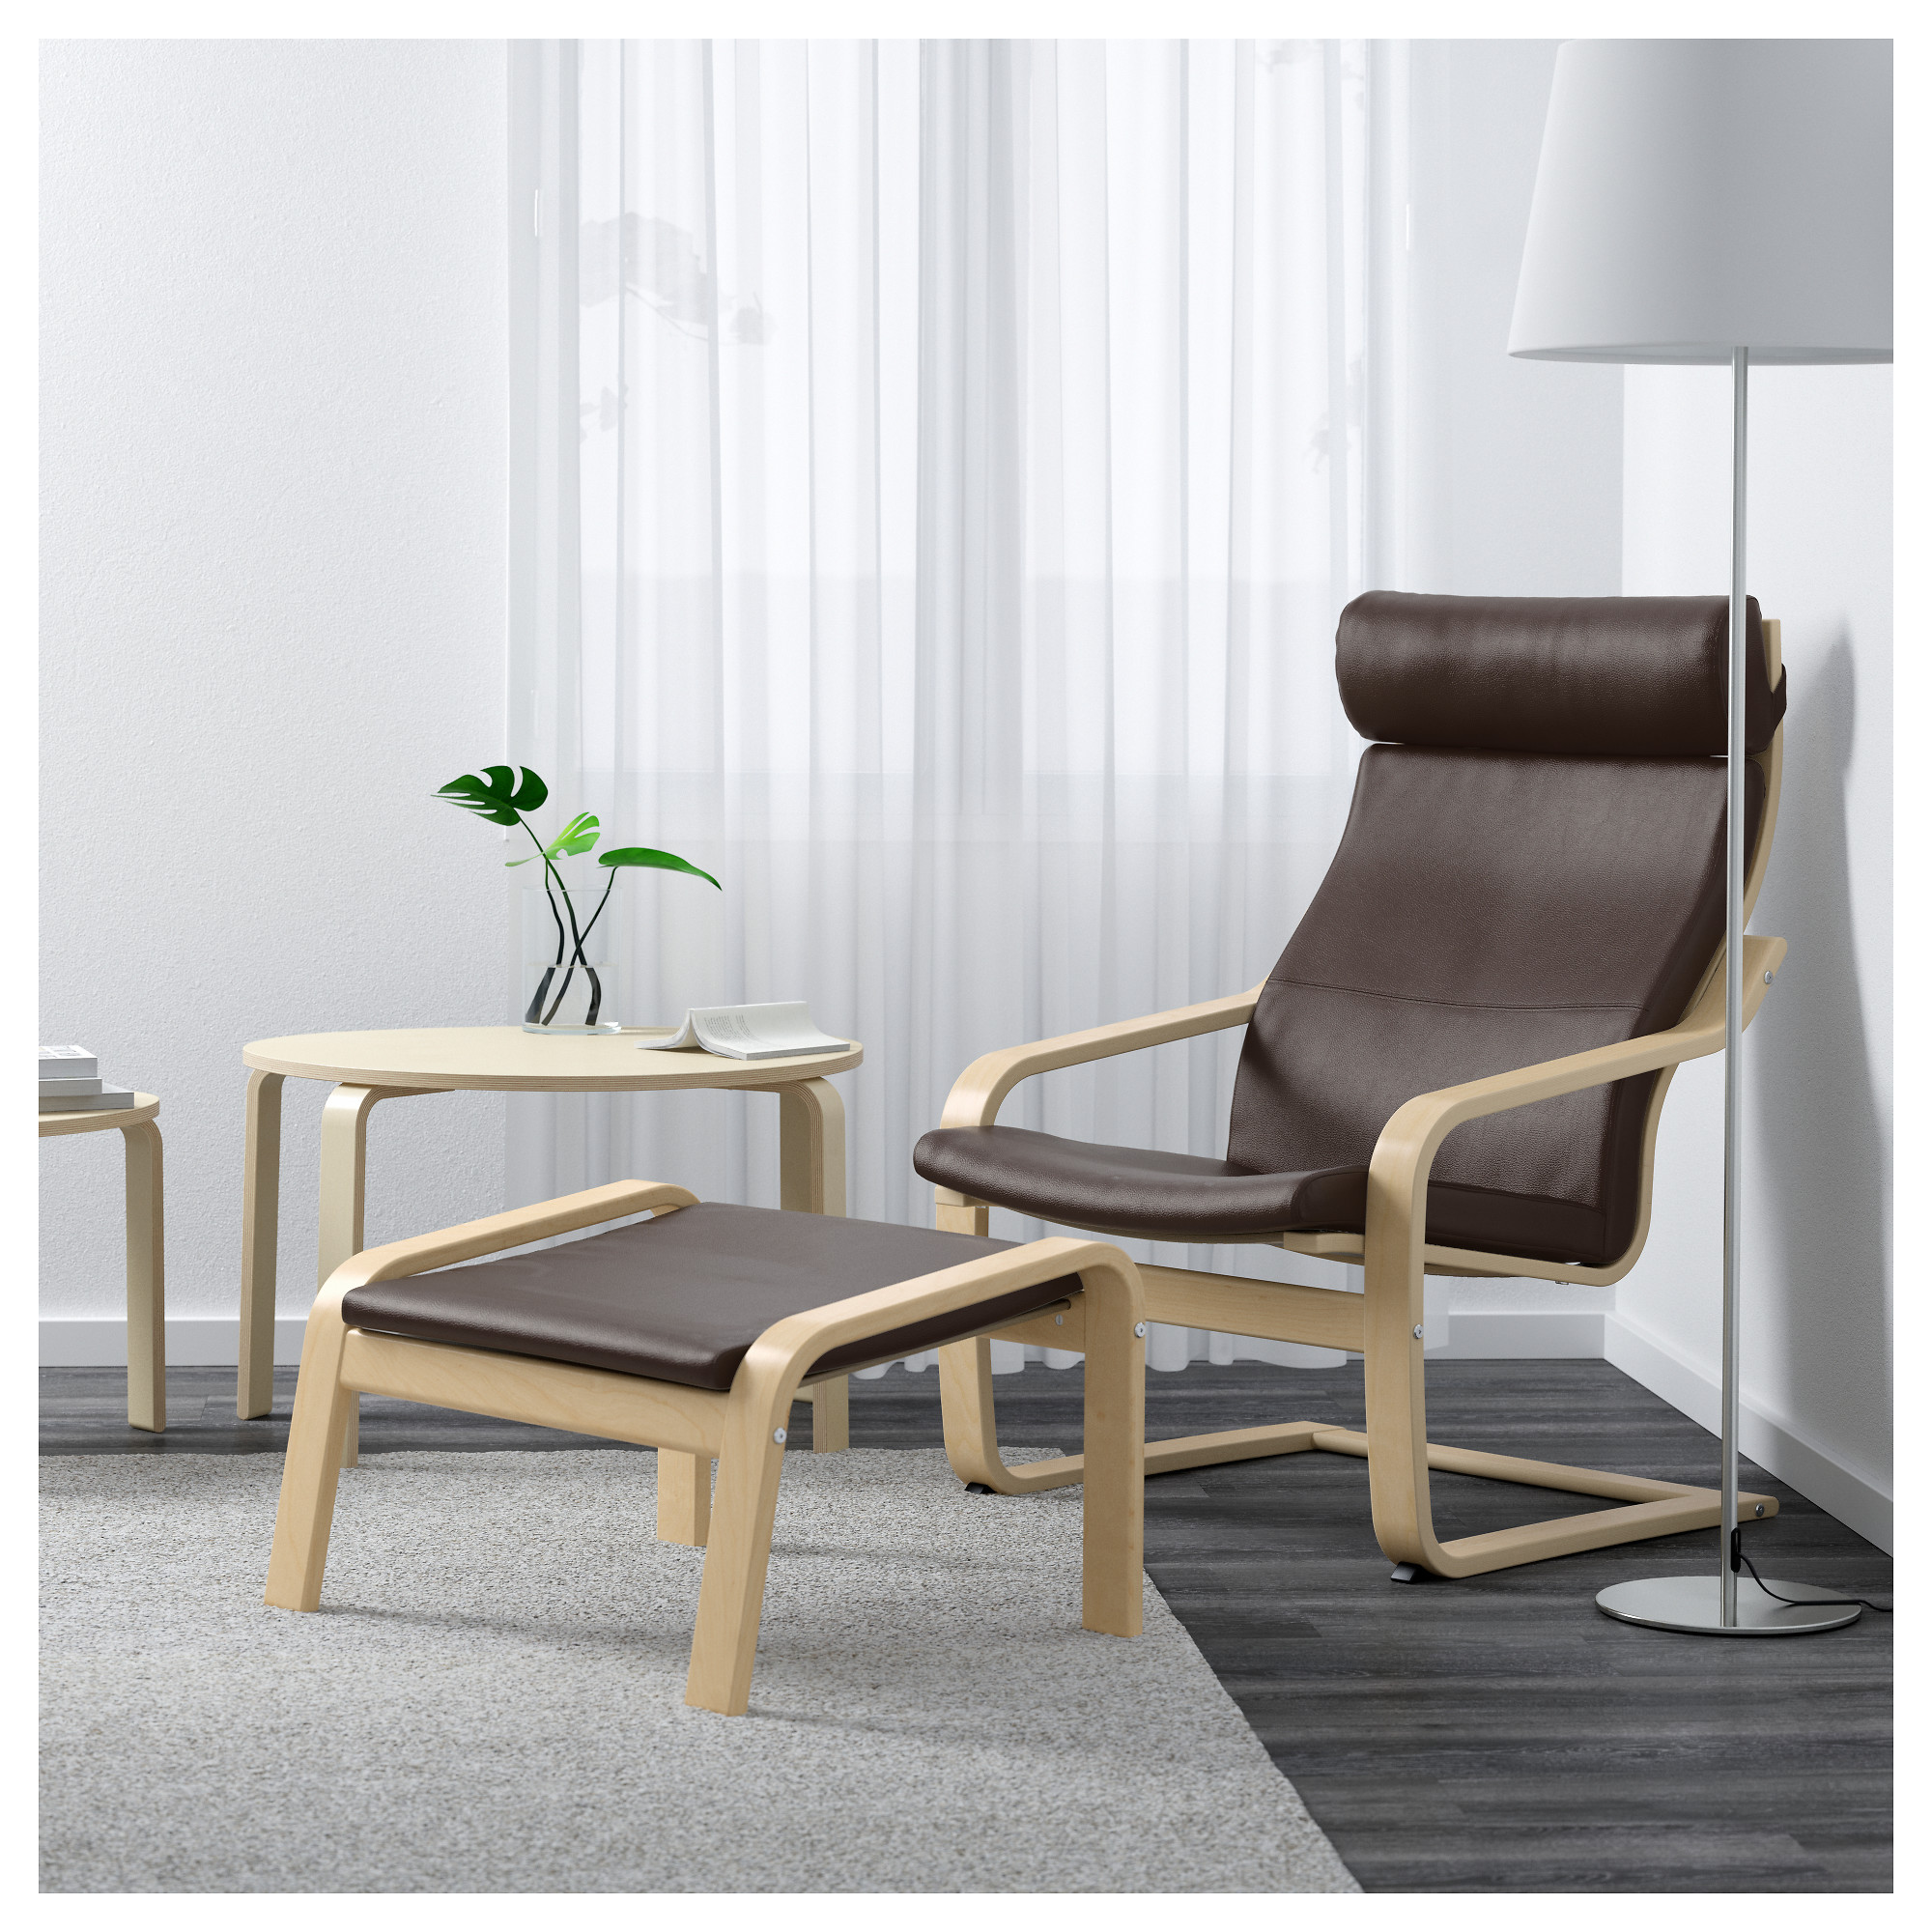 Fine Ikea Lithuania Shop For Furniture Lighting Home Machost Co Dining Chair Design Ideas Machostcouk